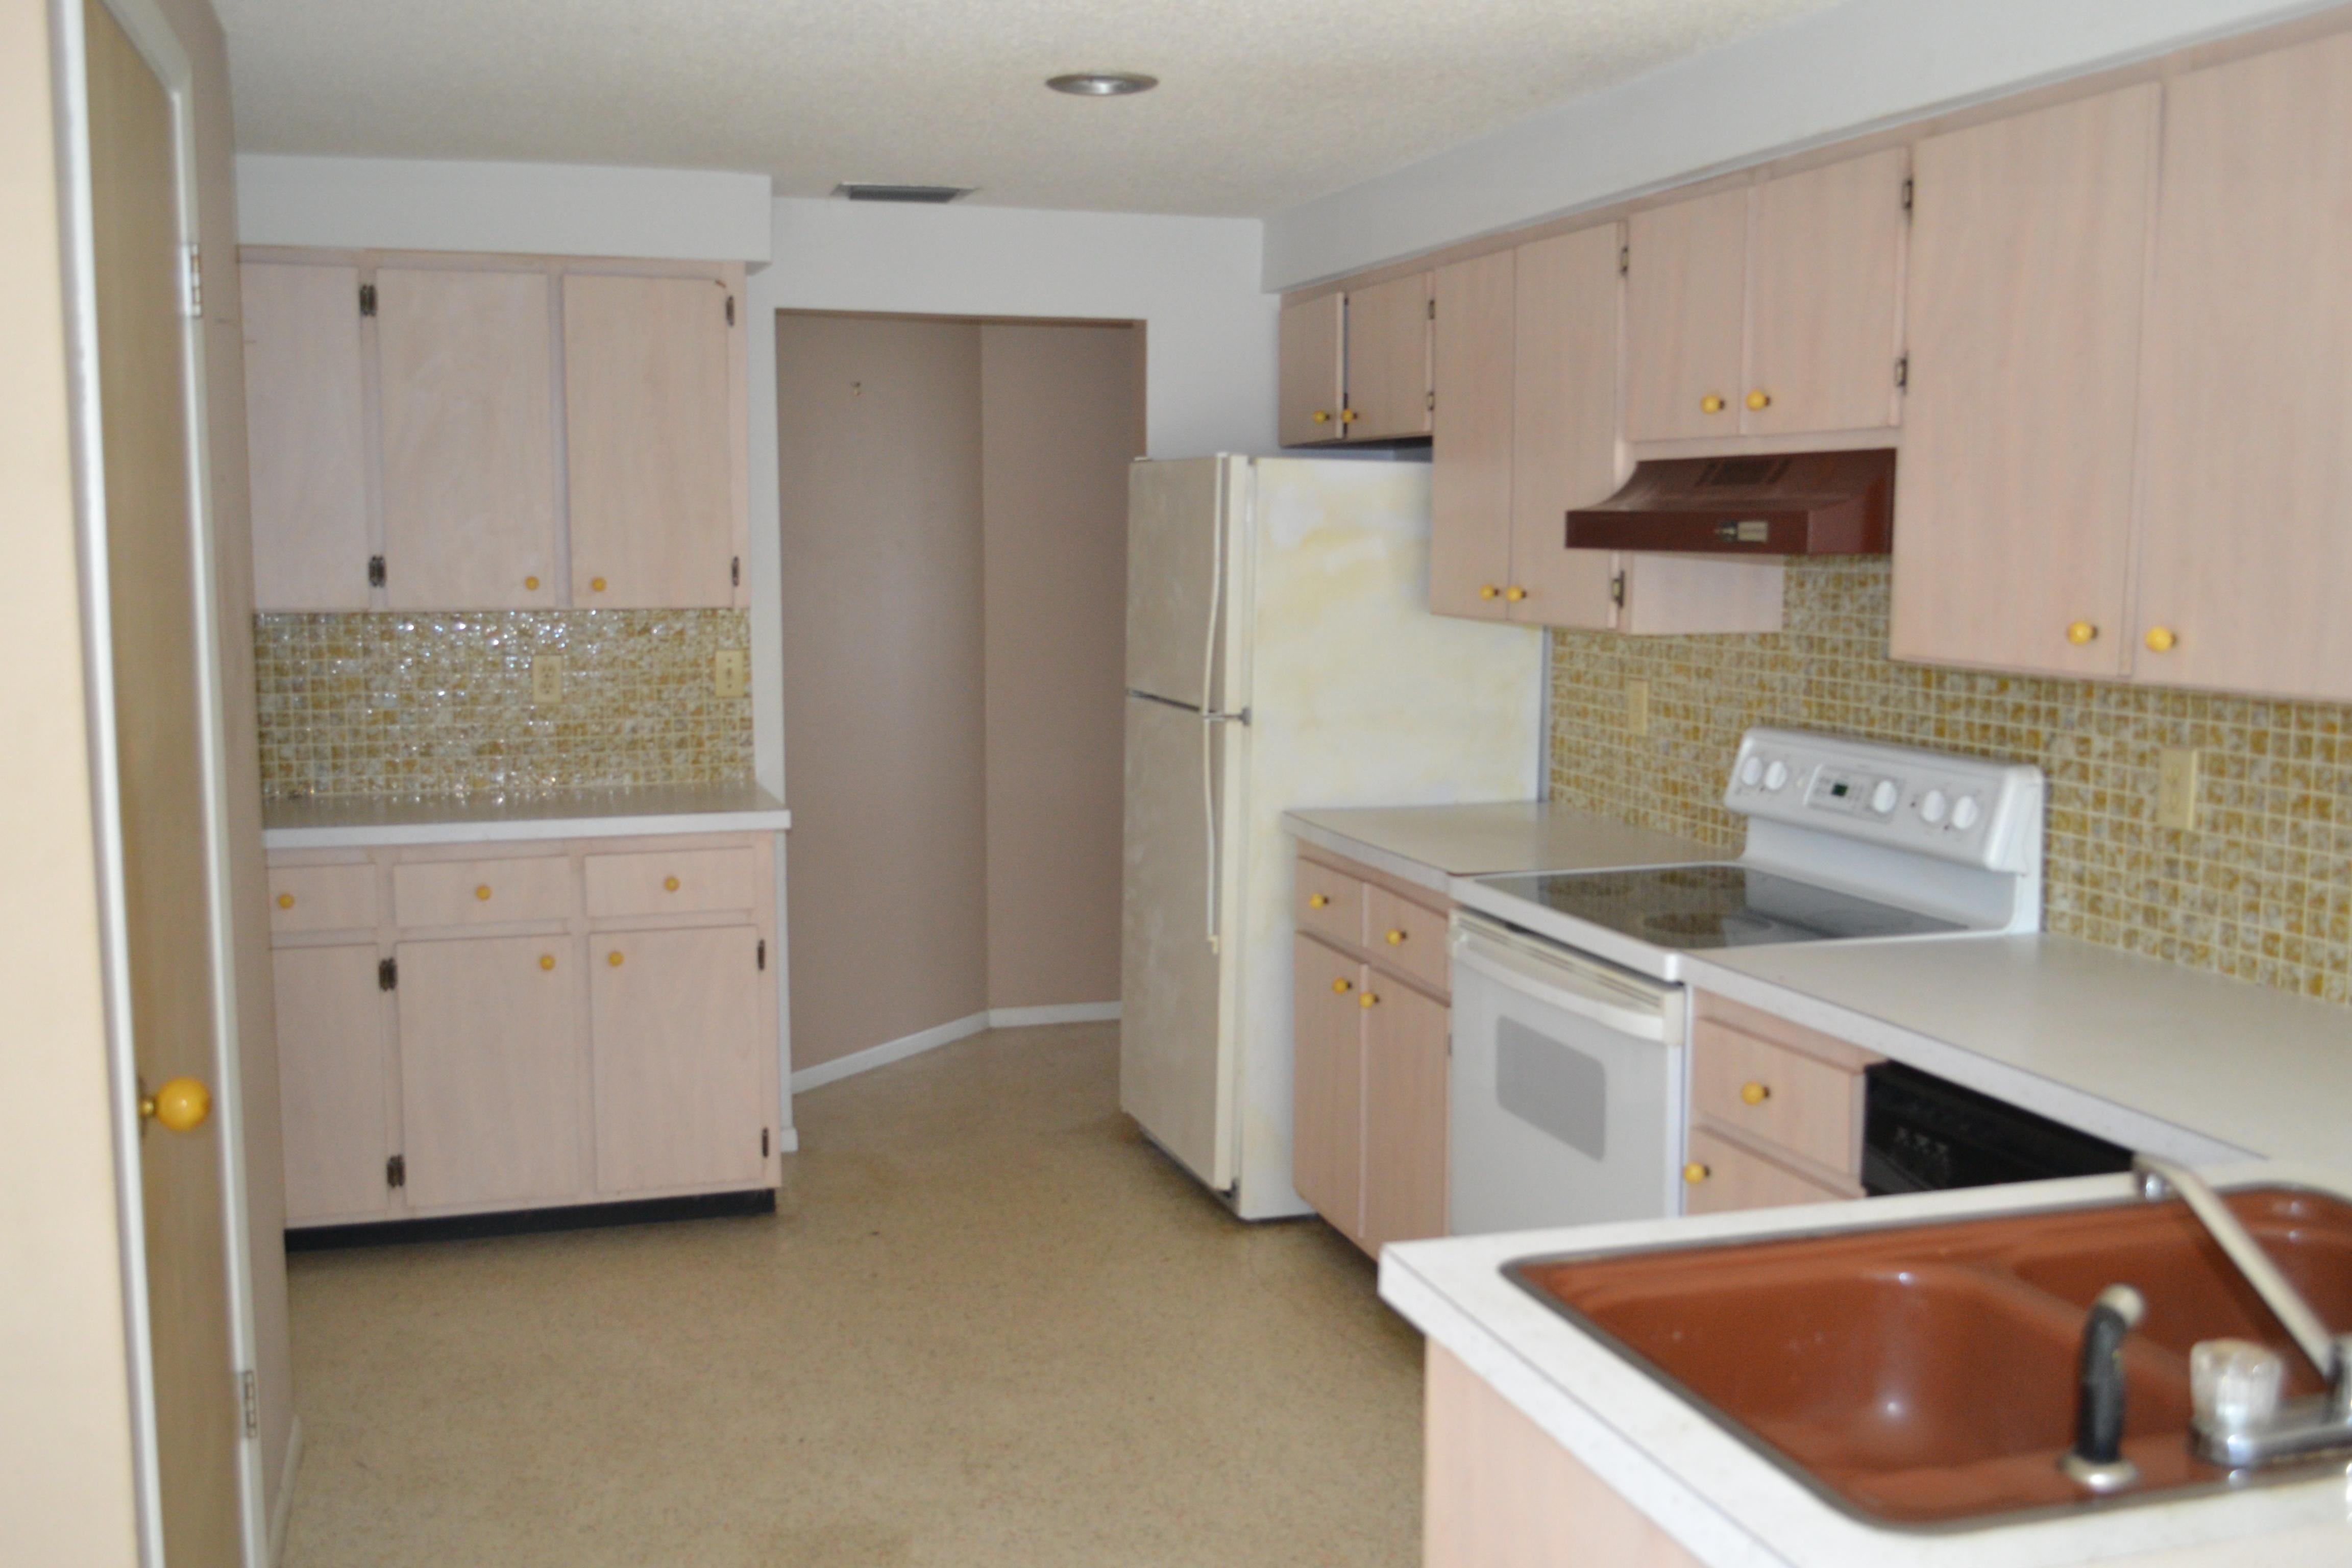 DSC_0107 - West Coast Property